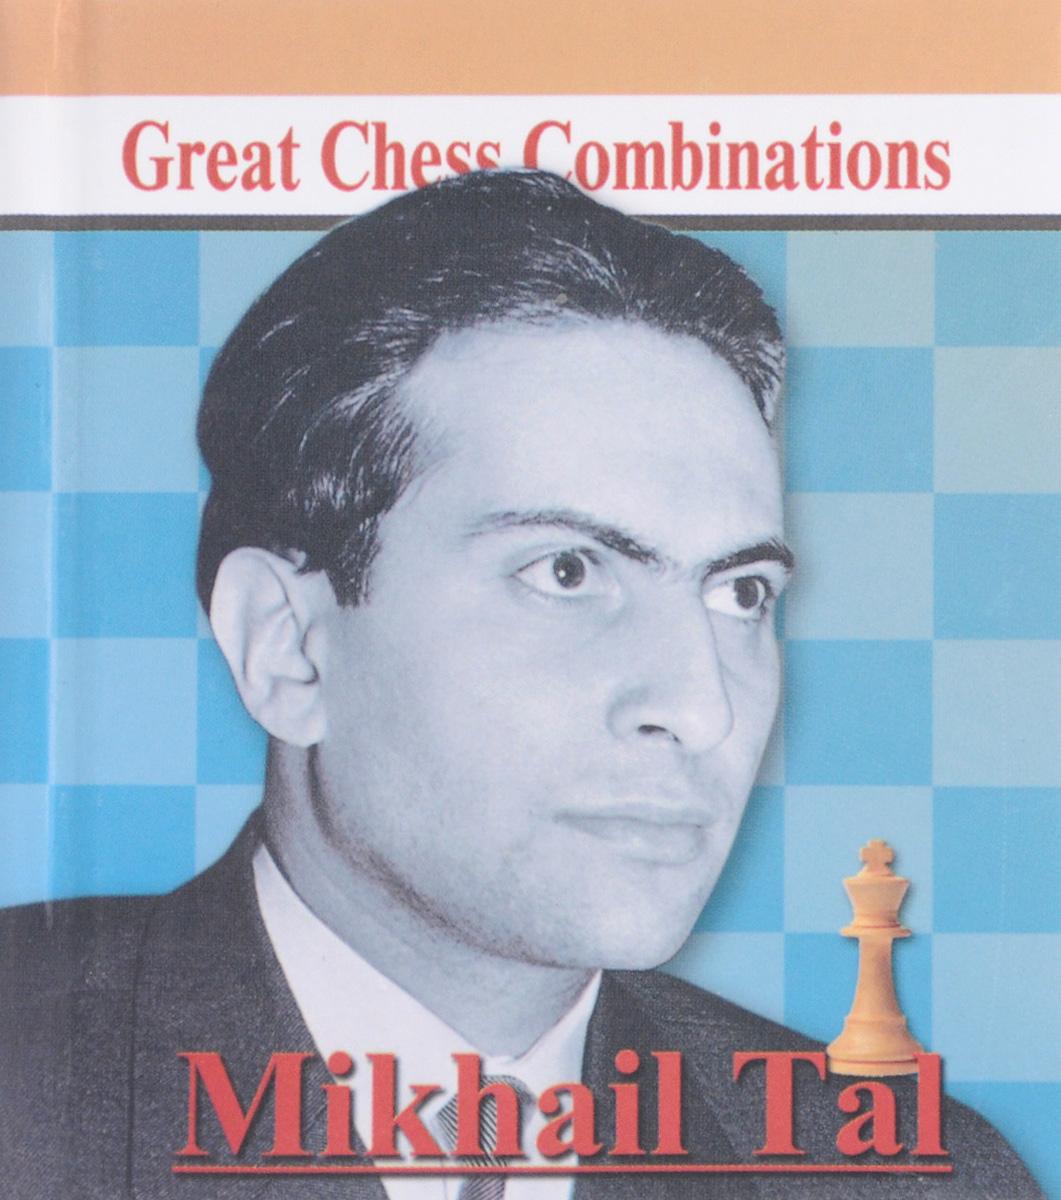 Mikhail Tal: Great Chess Combinations / Михаил Таль. Лучшие шахматные комбинации (миниатюрное издание). Александр Калинин